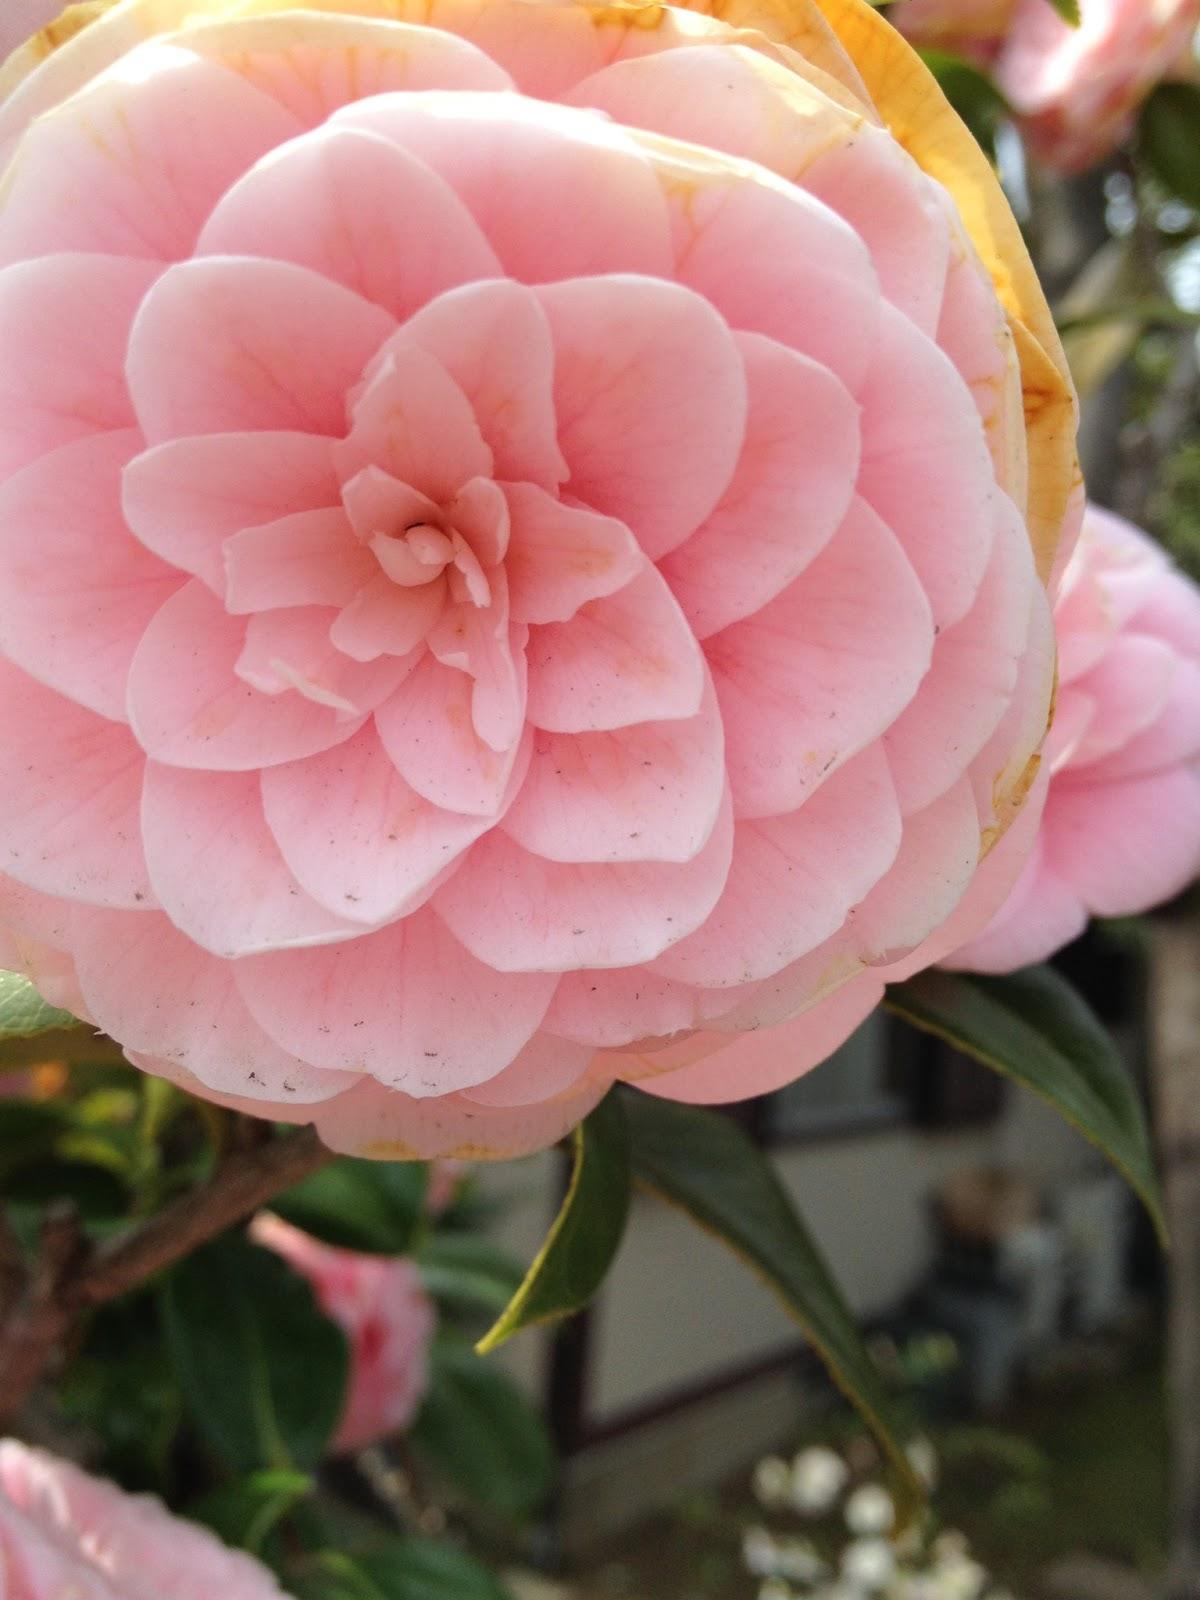 Marketing Japan Beautiful Flowers In Japans Springtime